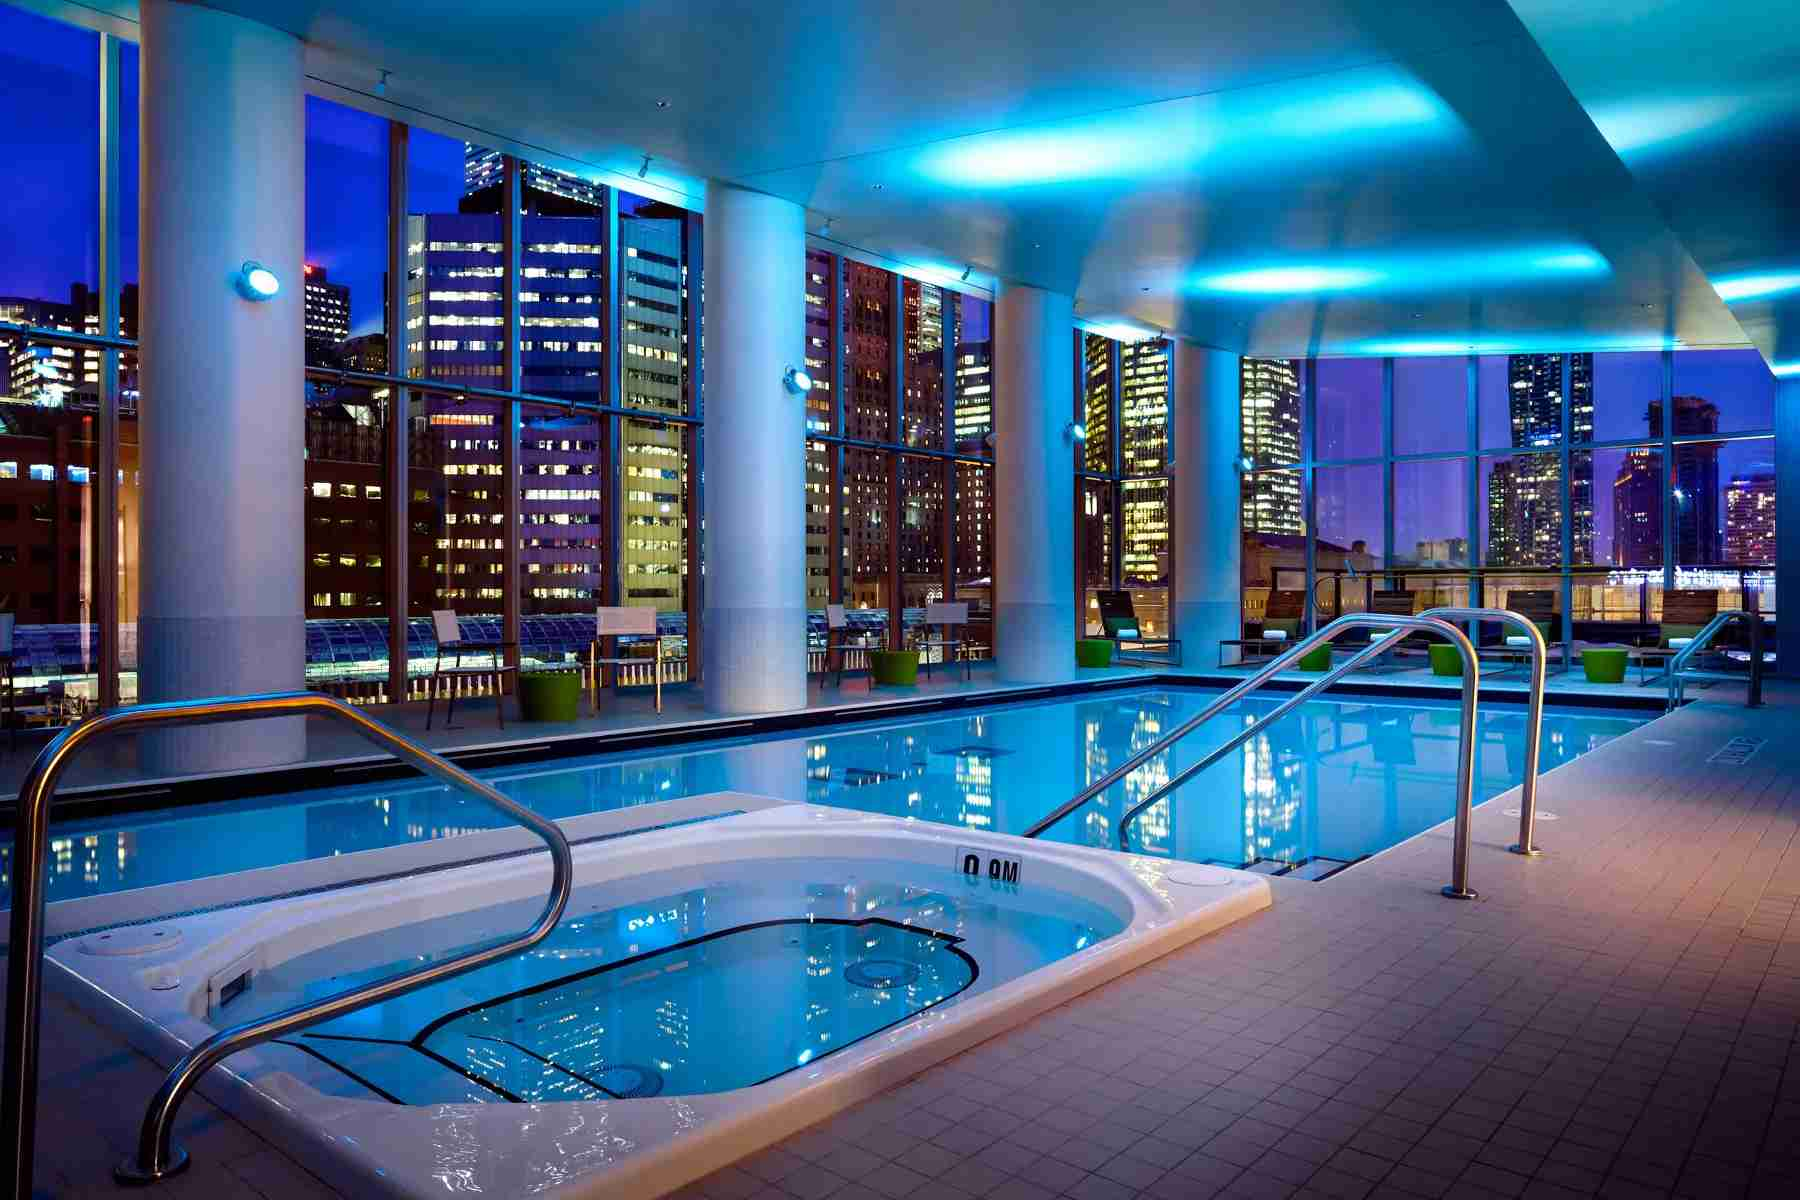 Image courtesy of the Delta Hotel Toronto.